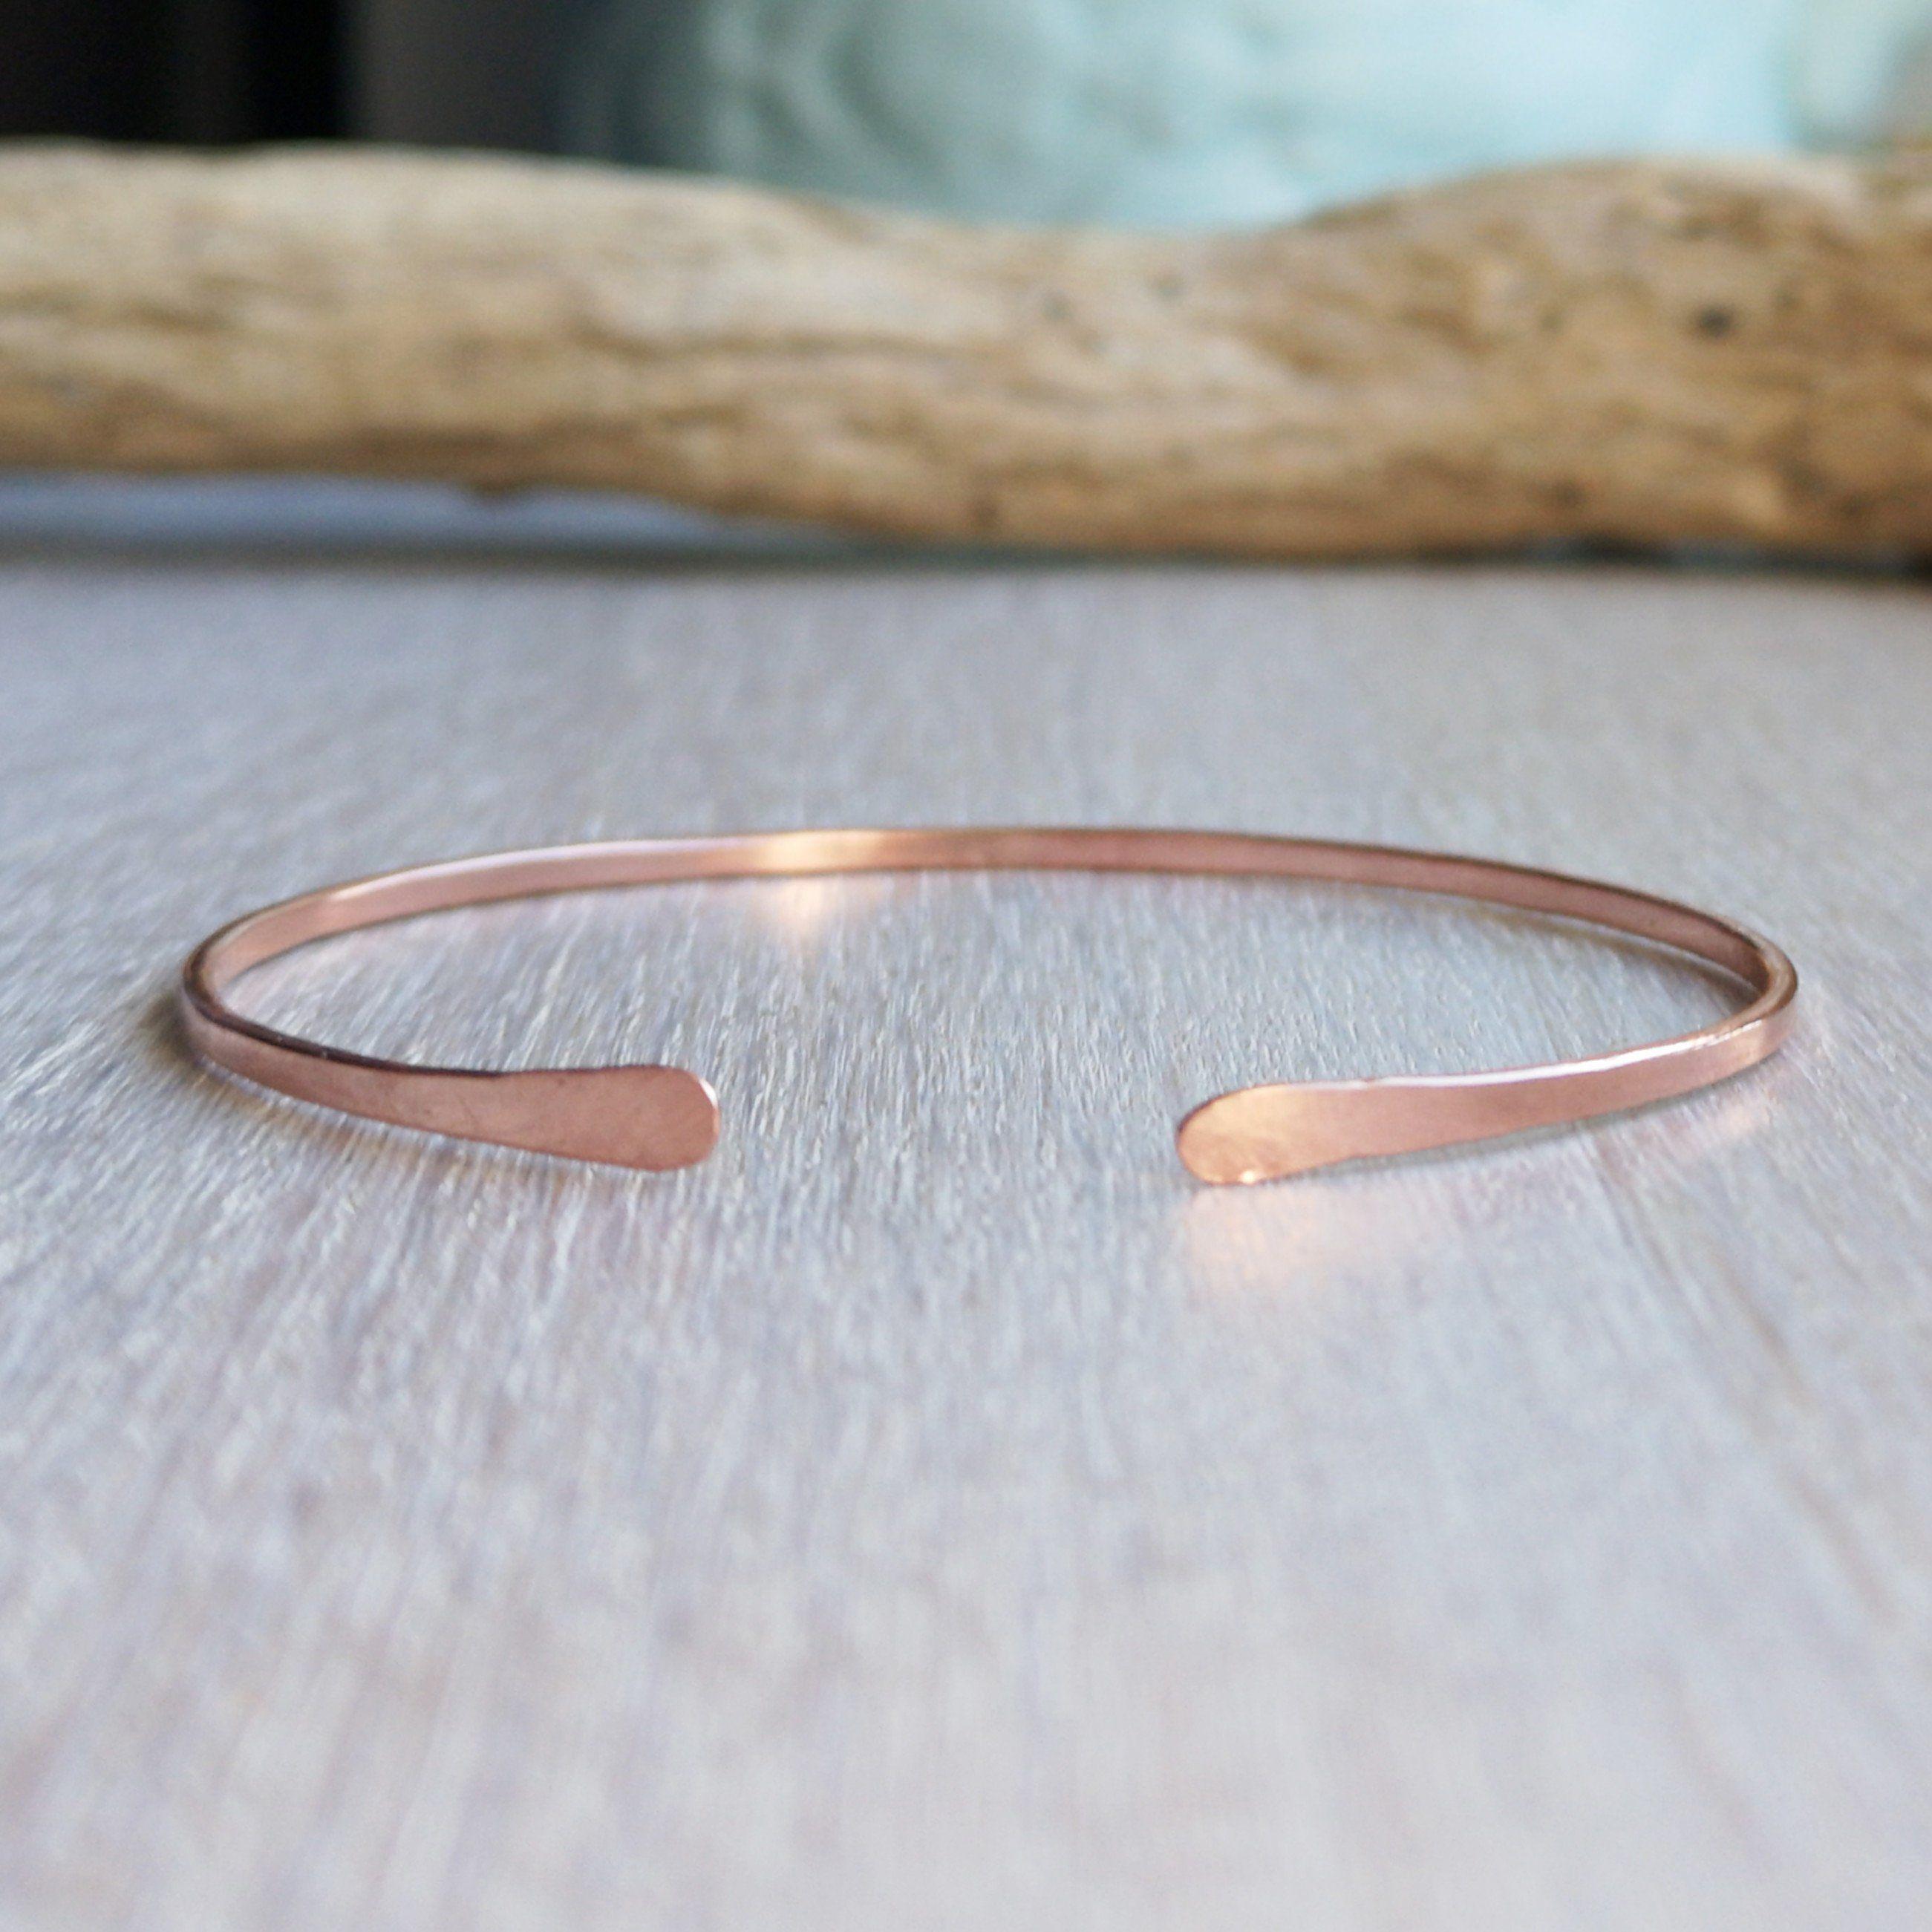 Adjustable copper bangle hammered smooth handmade gift